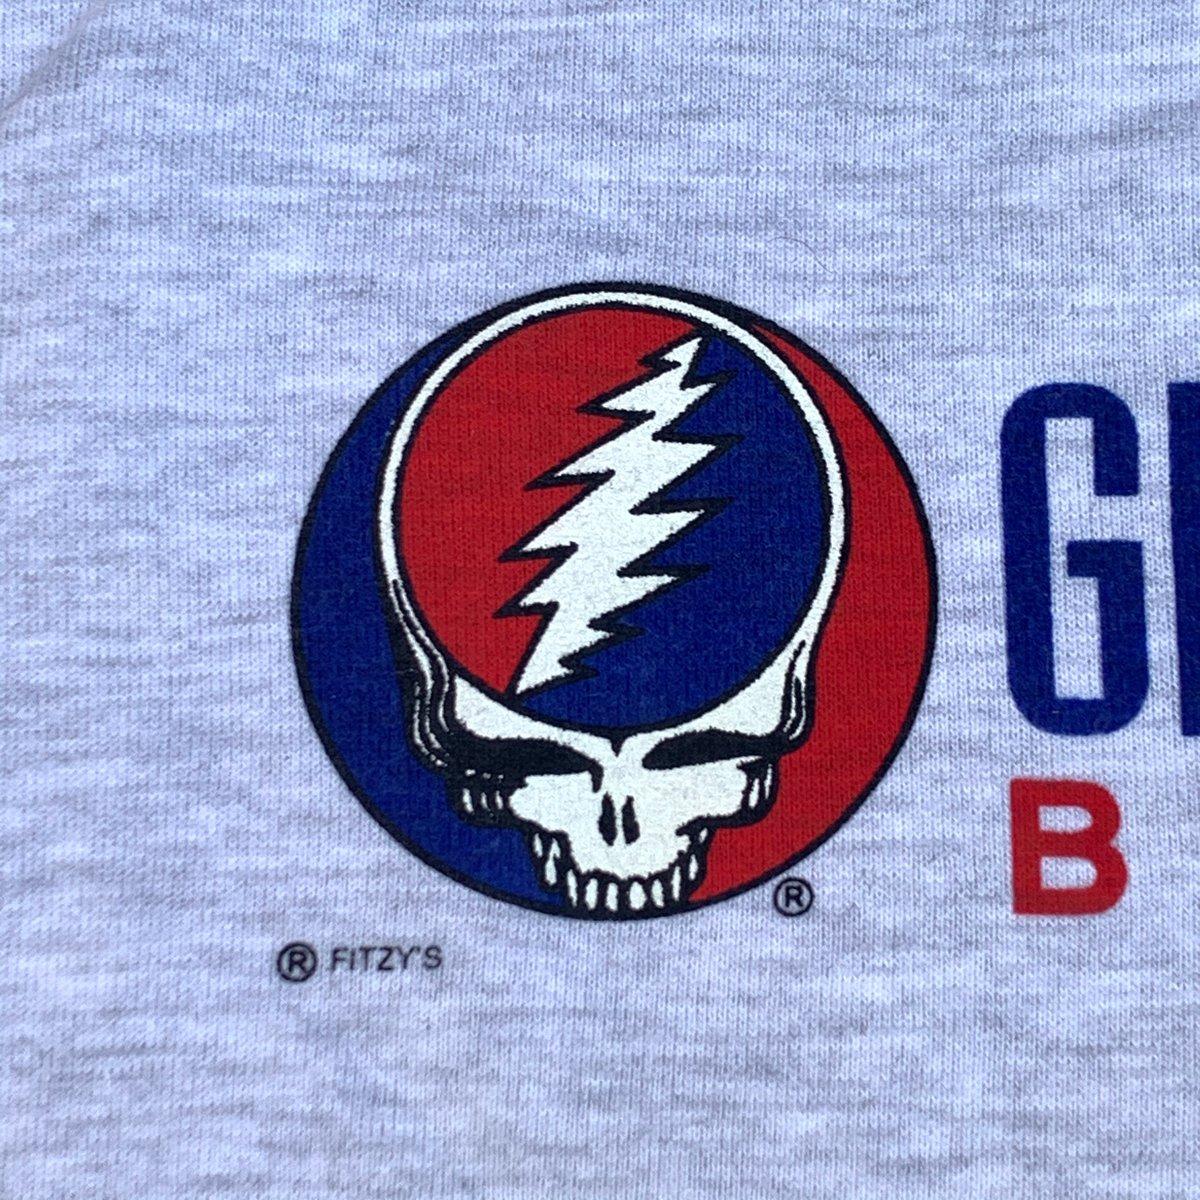 Original Vintage Grateful Dead 1994 Long Sleeve Crewneck Sweatshirt! LARGE